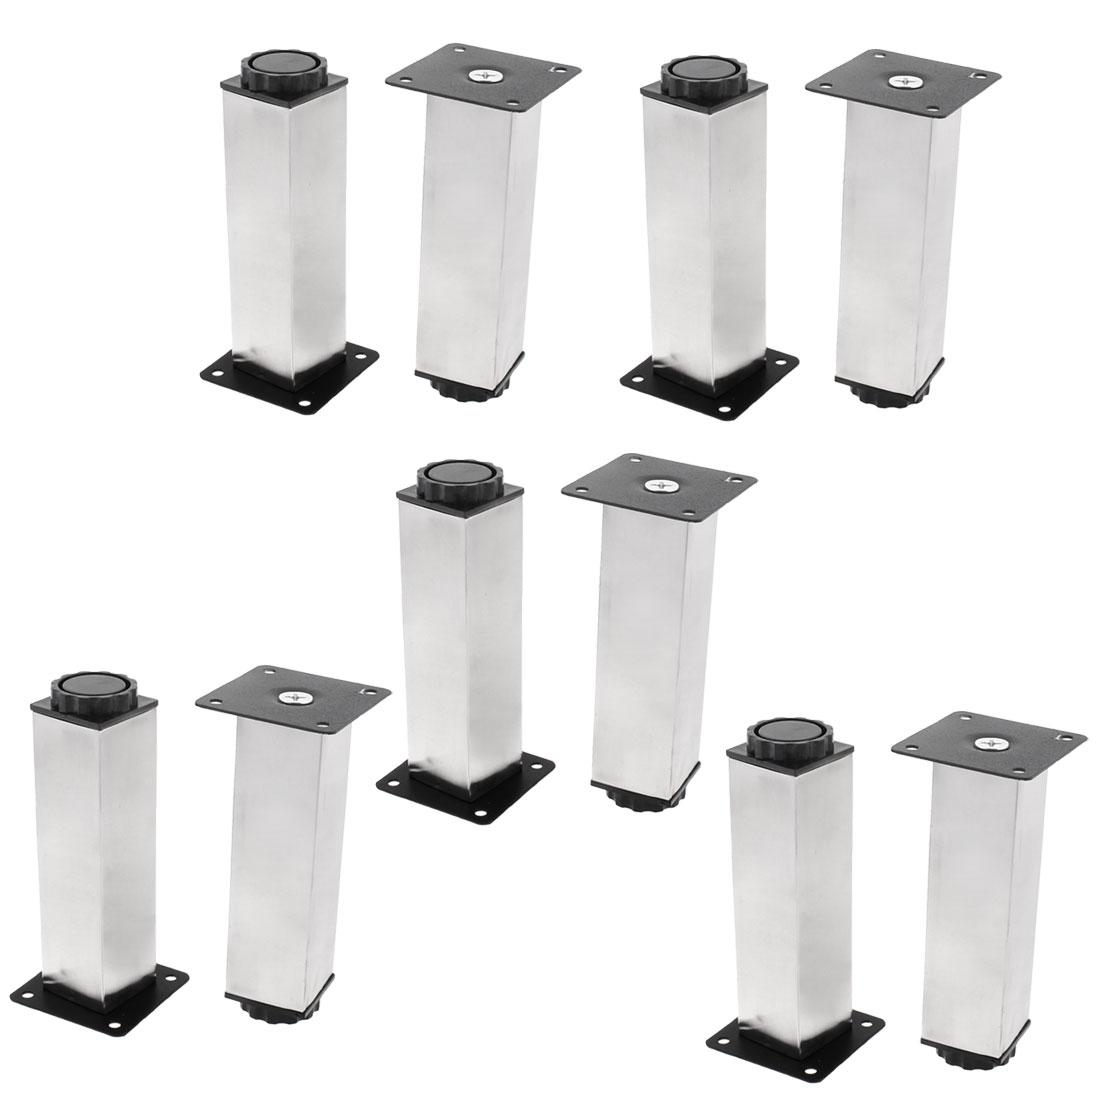 Kitchen Furniture Cabinet Square Adjustable Plinth Leg Feet 38 x 150mm 10pcs